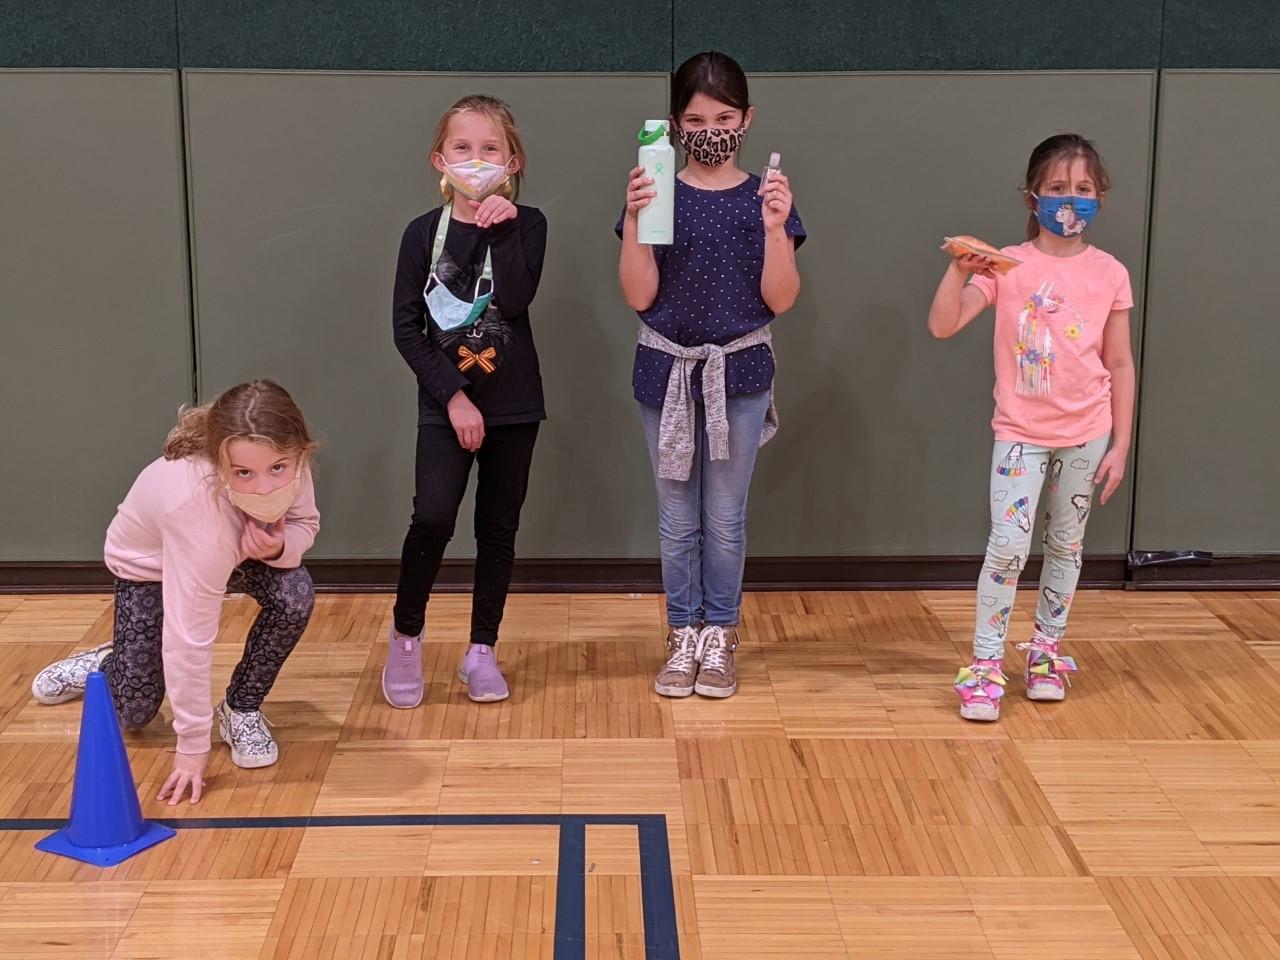 Kids at Cherry Tree Elementary ESE